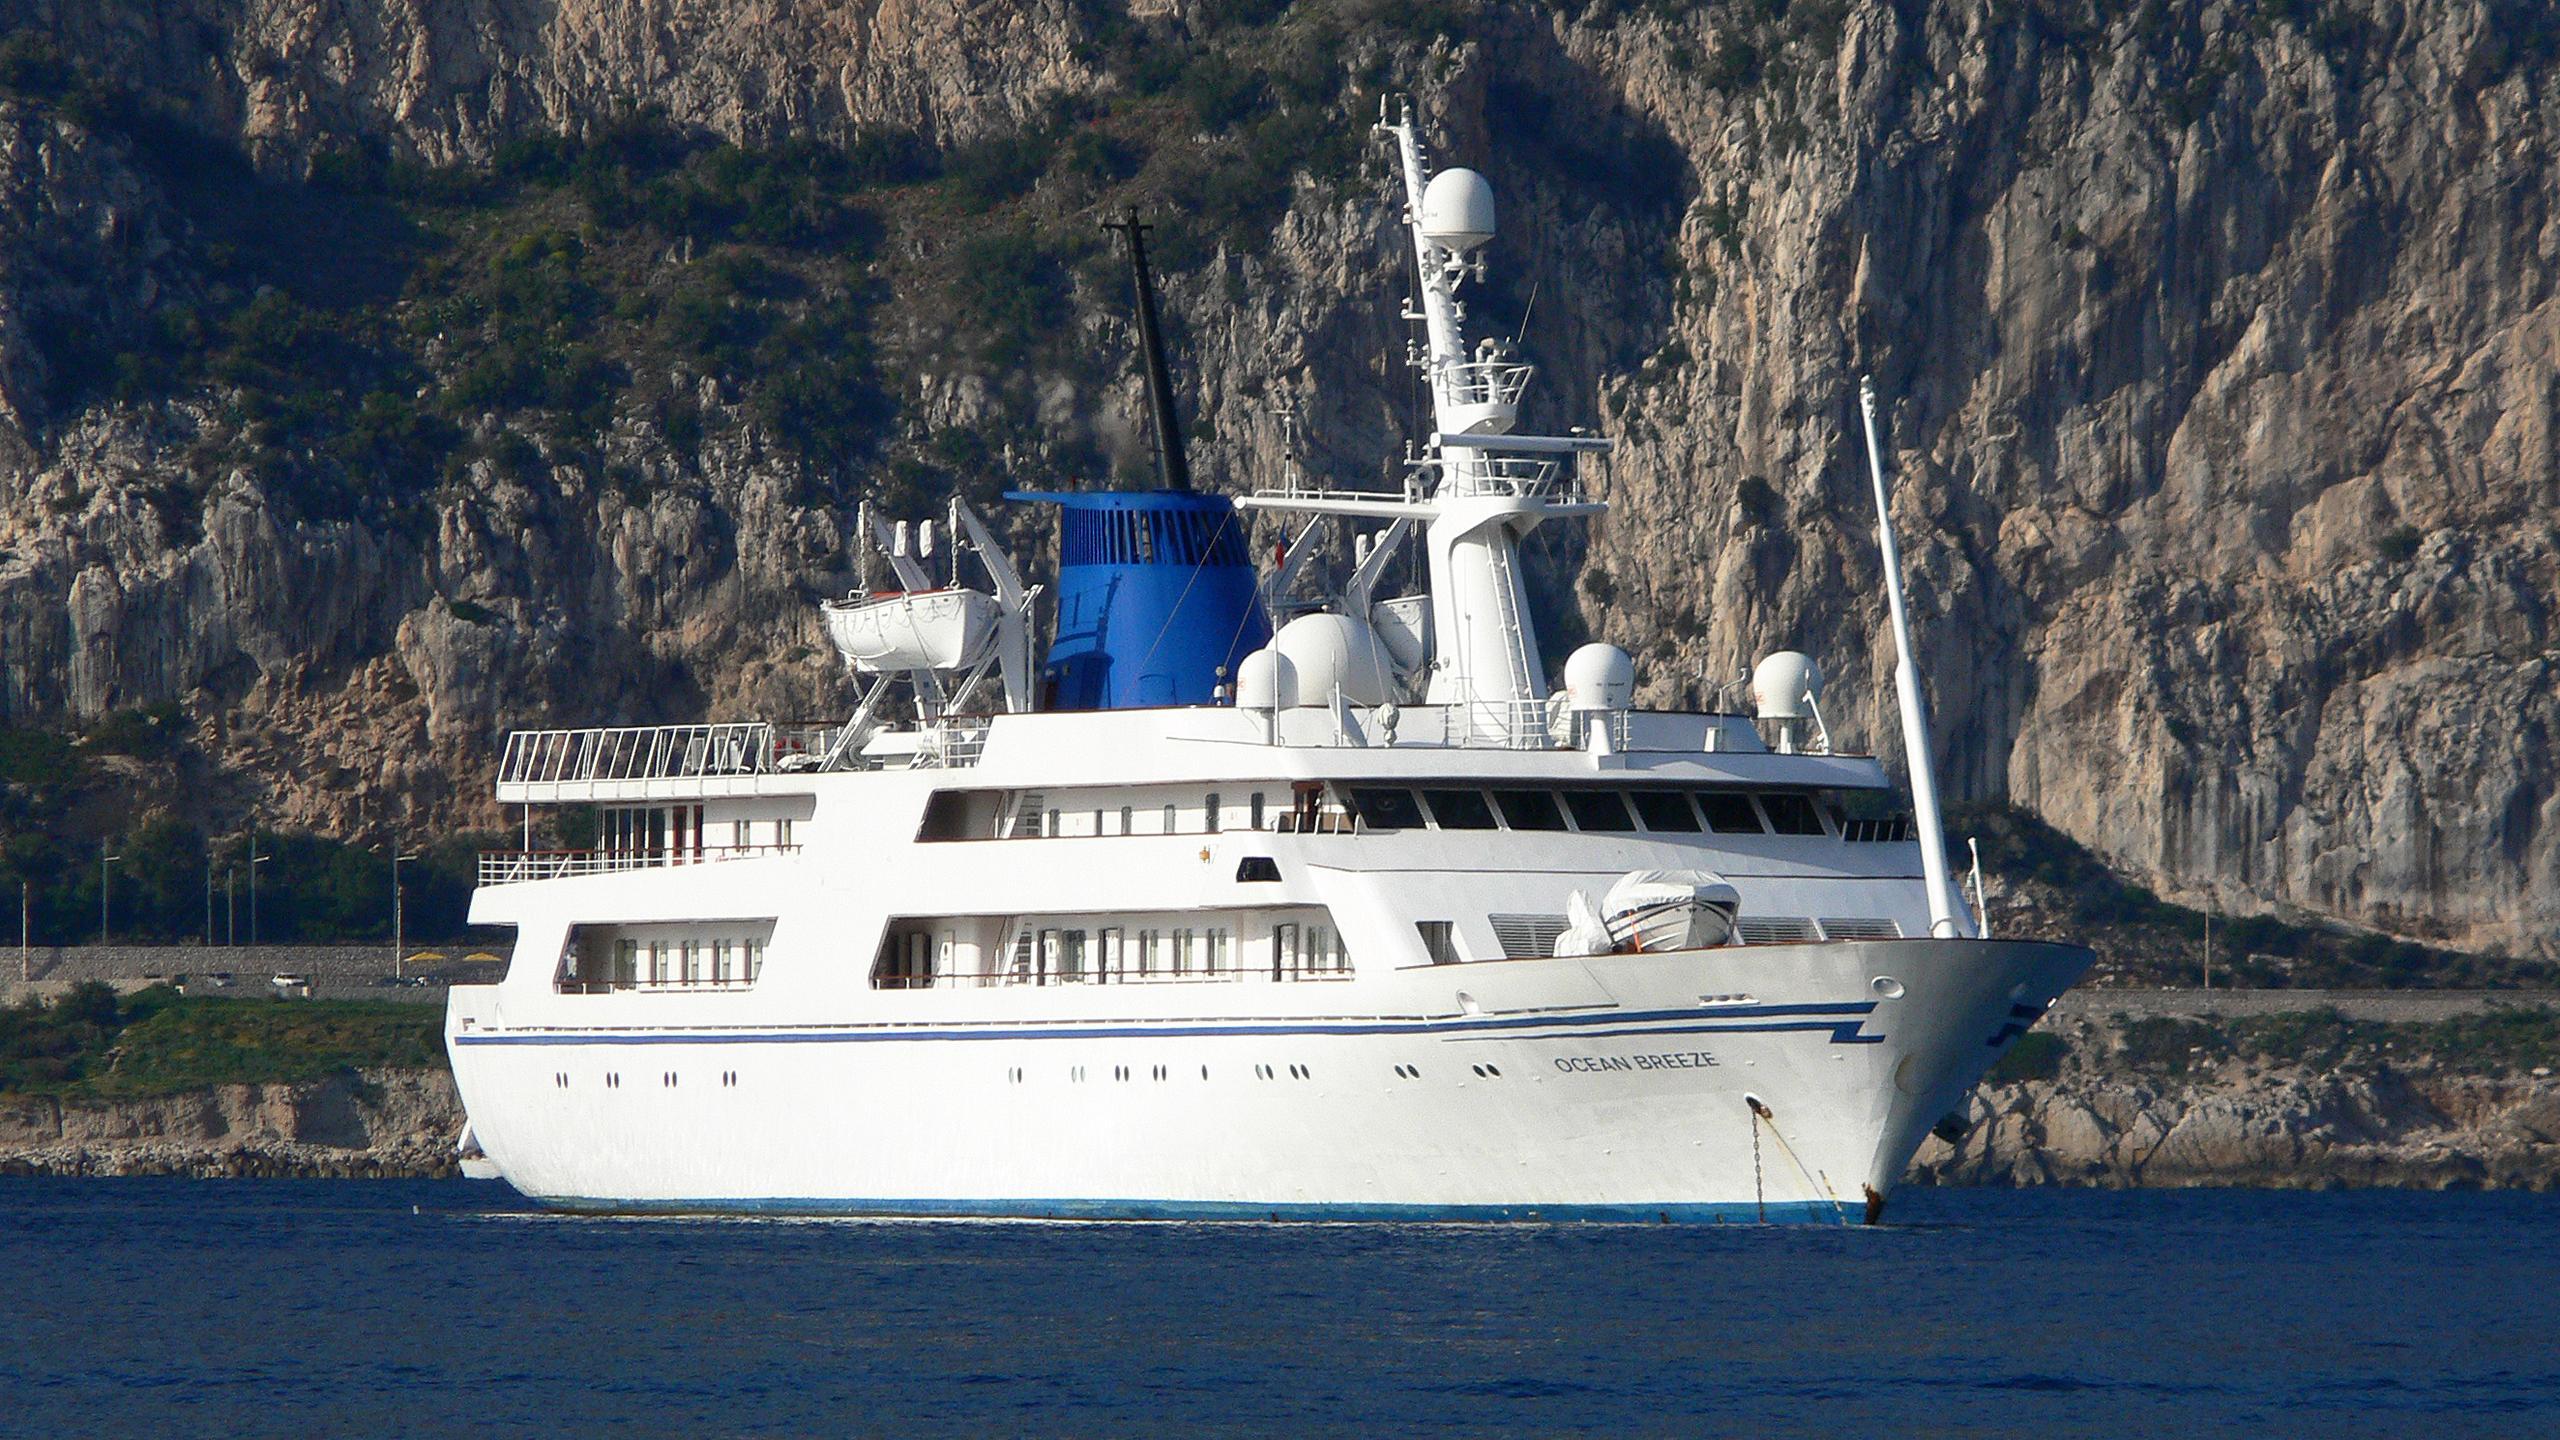 basrah-breeze-motor-yacht-helsingor-vaerft-1981-82m-half-profile